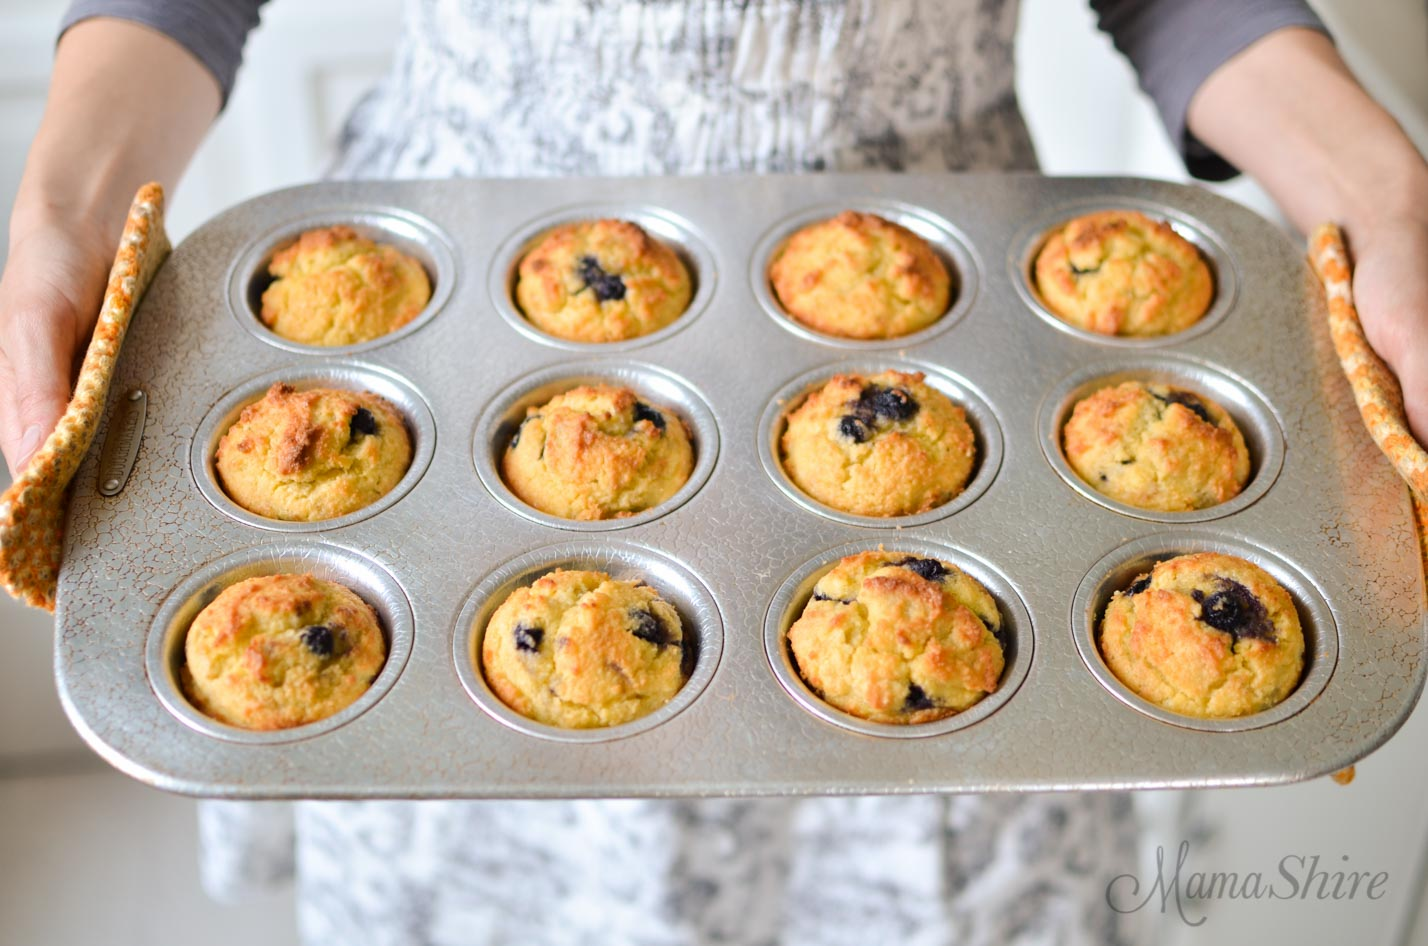 Lemon Blueberry Muffins (Gluten-free)